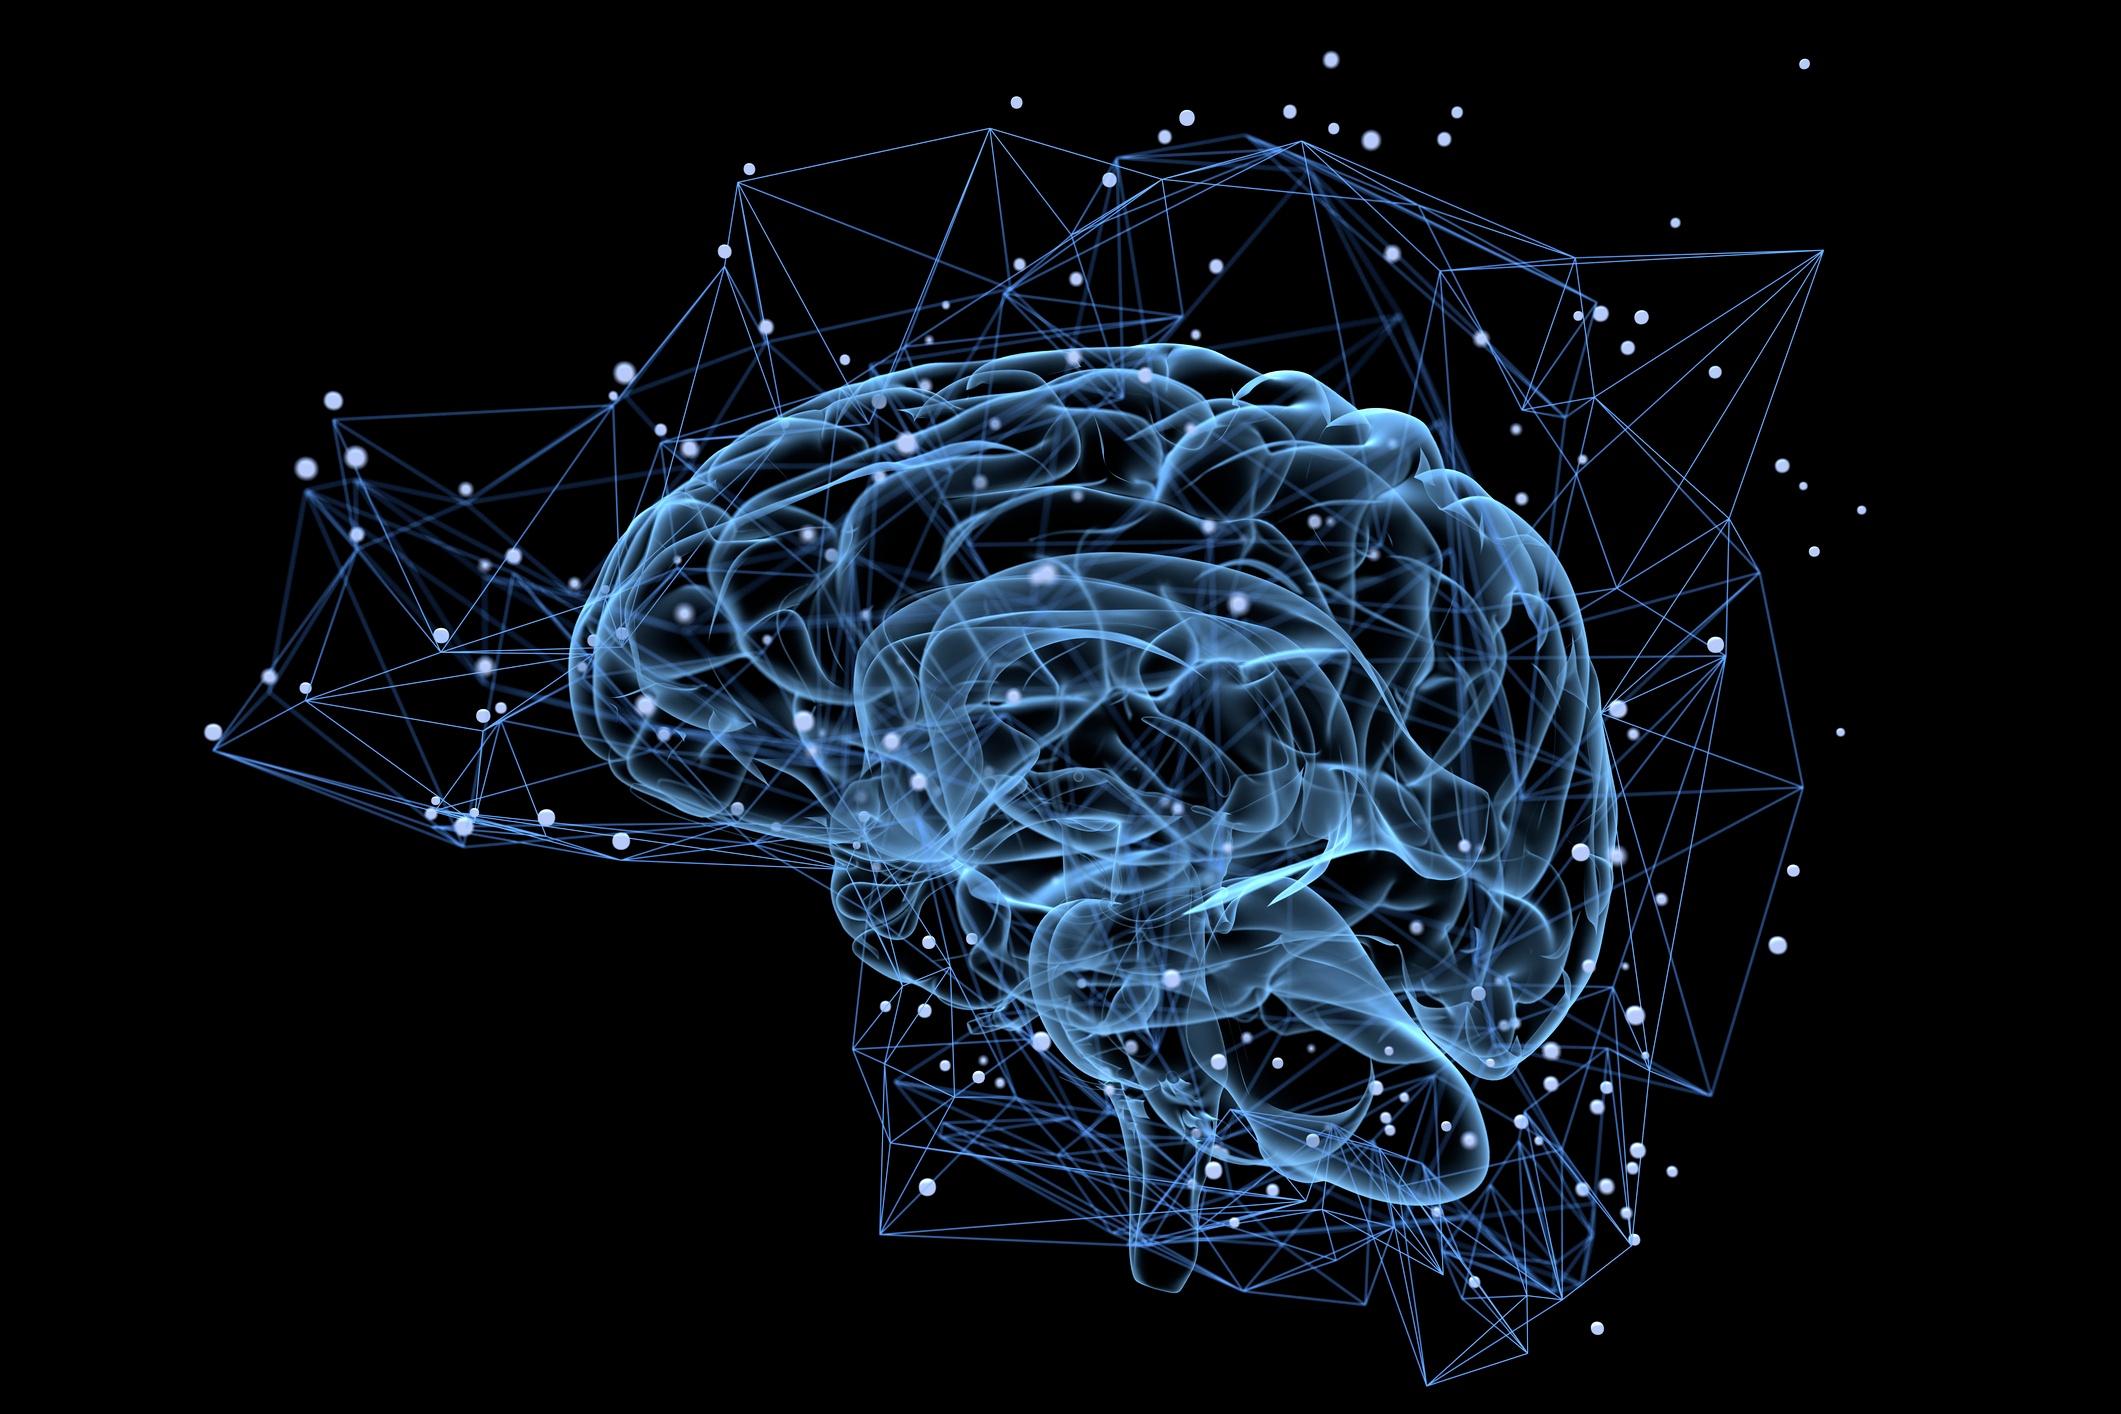 Brain-activity-497487570_2125x1416.jpeg